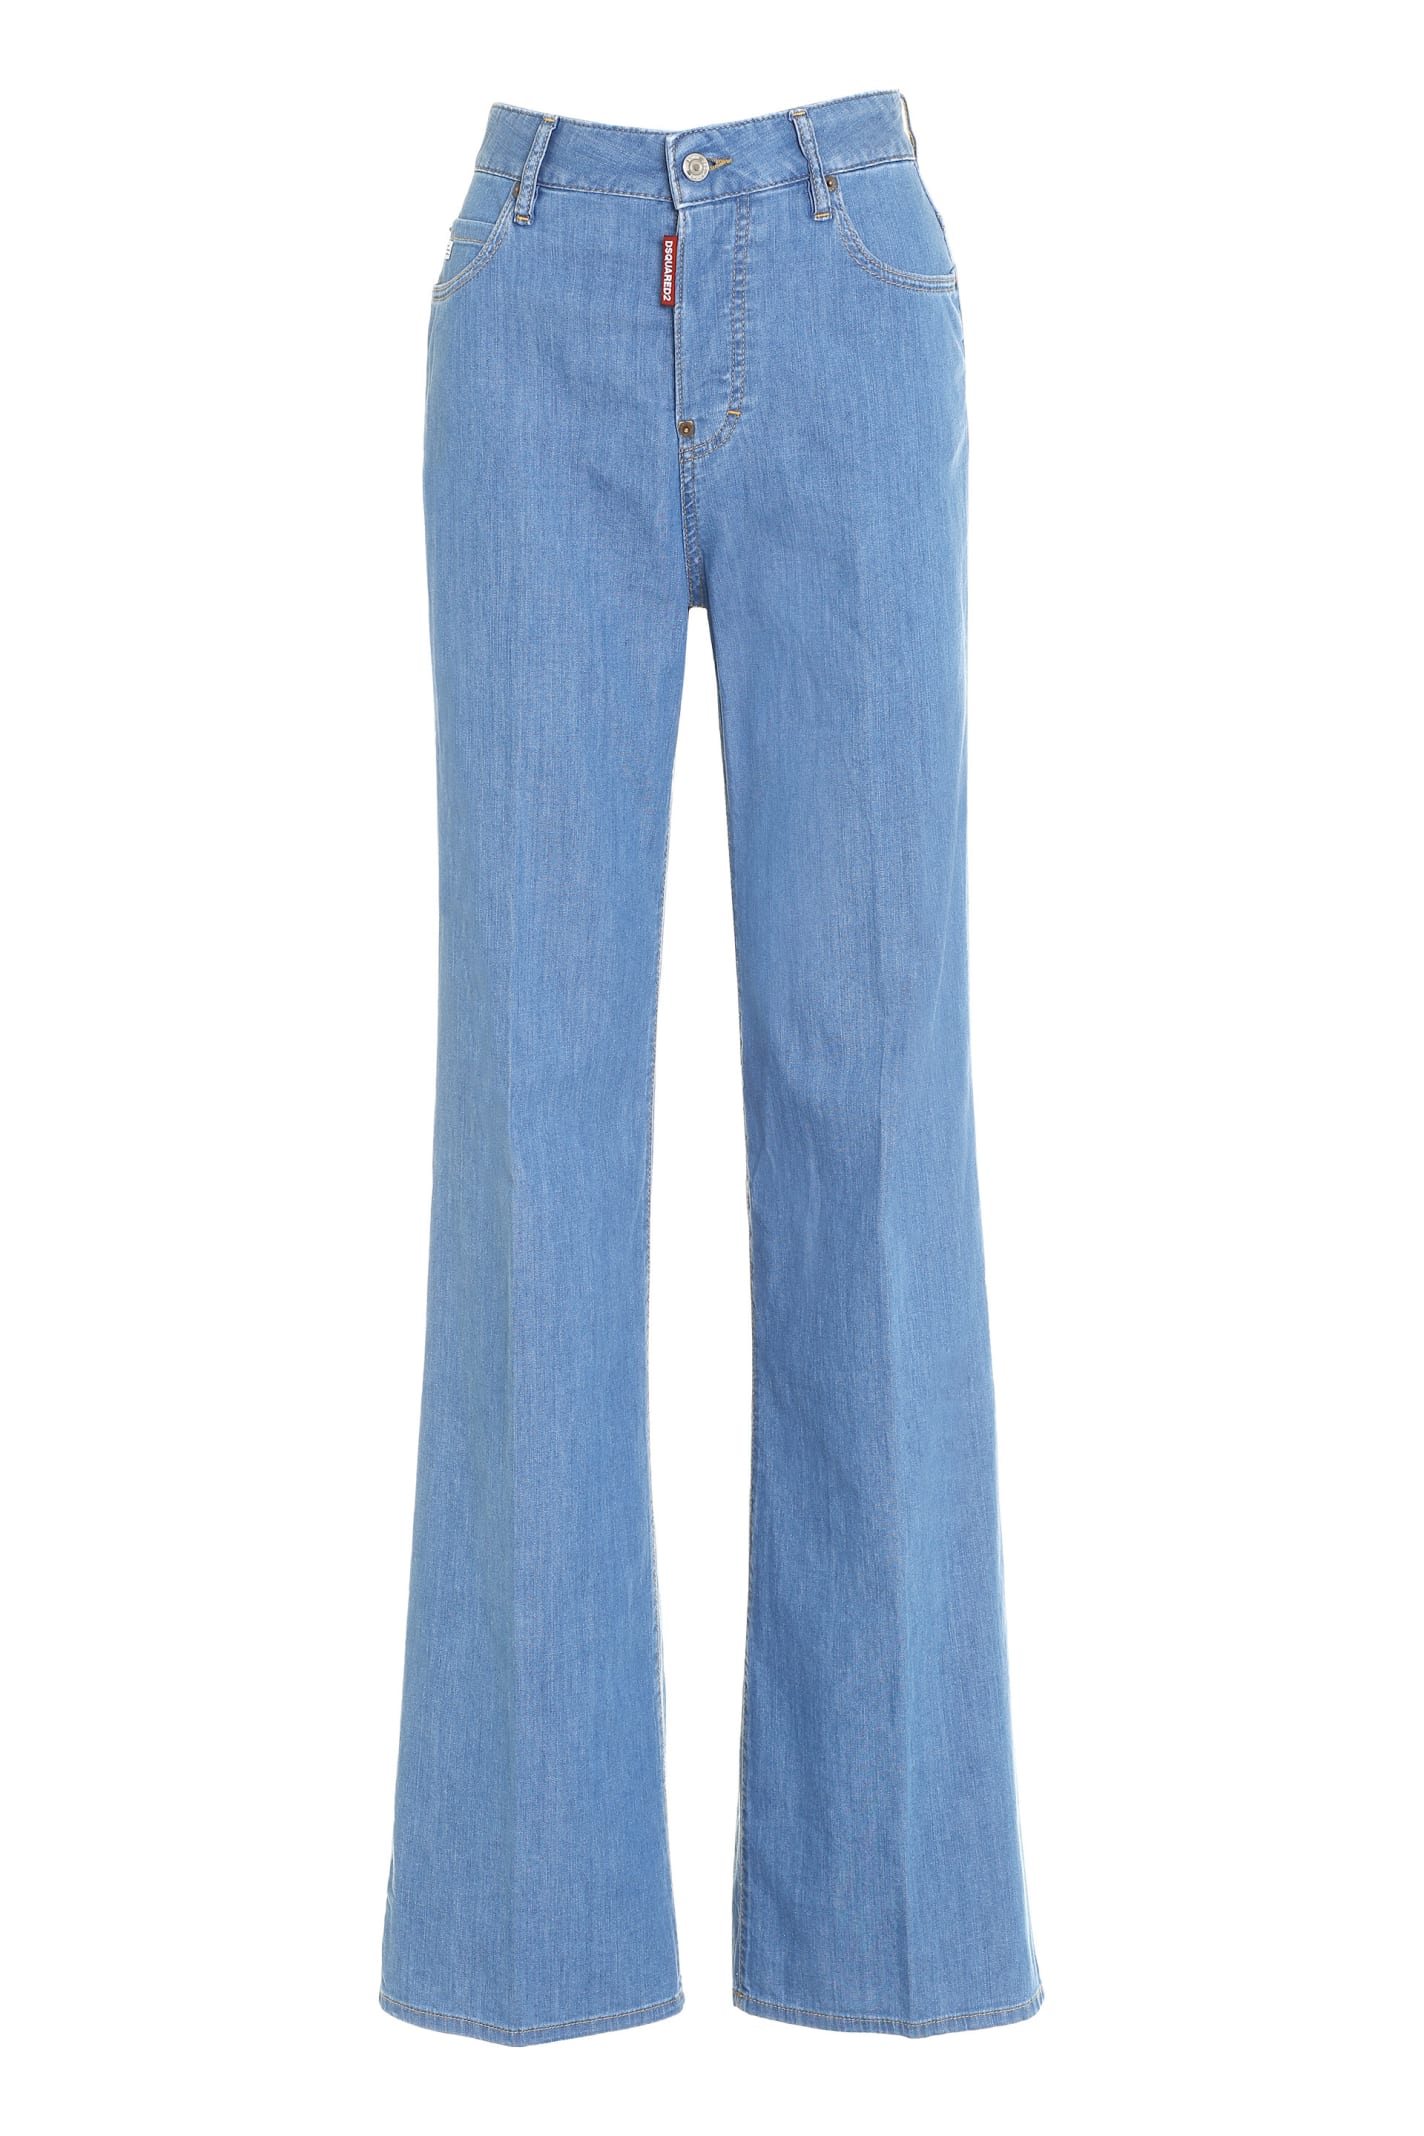 Dsquared2 Bohemian Wide Leg Jeans